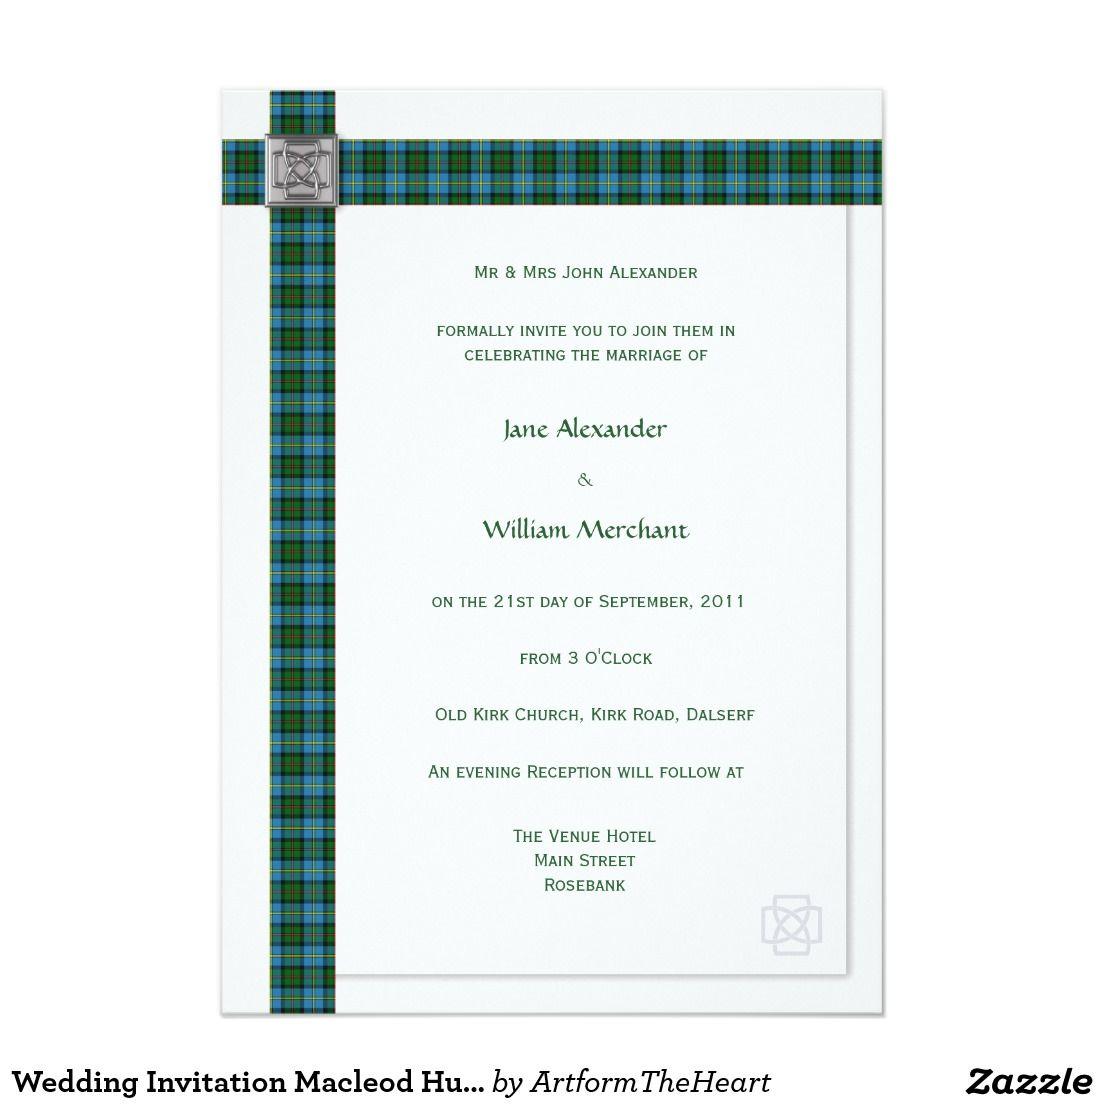 Wedding Invitation Macleod Hunting Tartan Plaid | TARTAN WEDDING ...